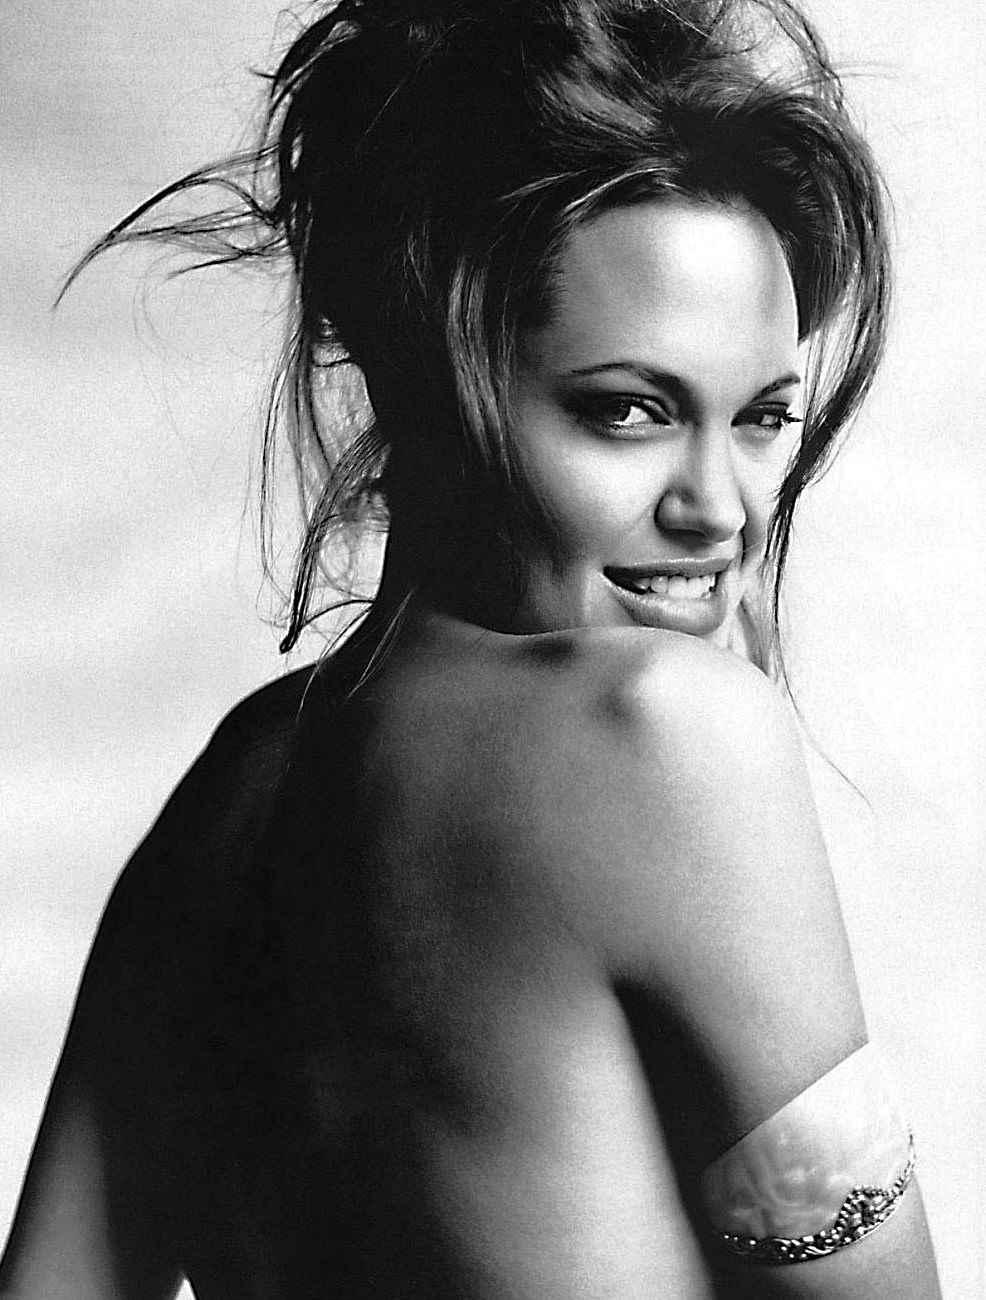 Mario-Testino-Angelina-Jolie-1.jpg (986×1300)